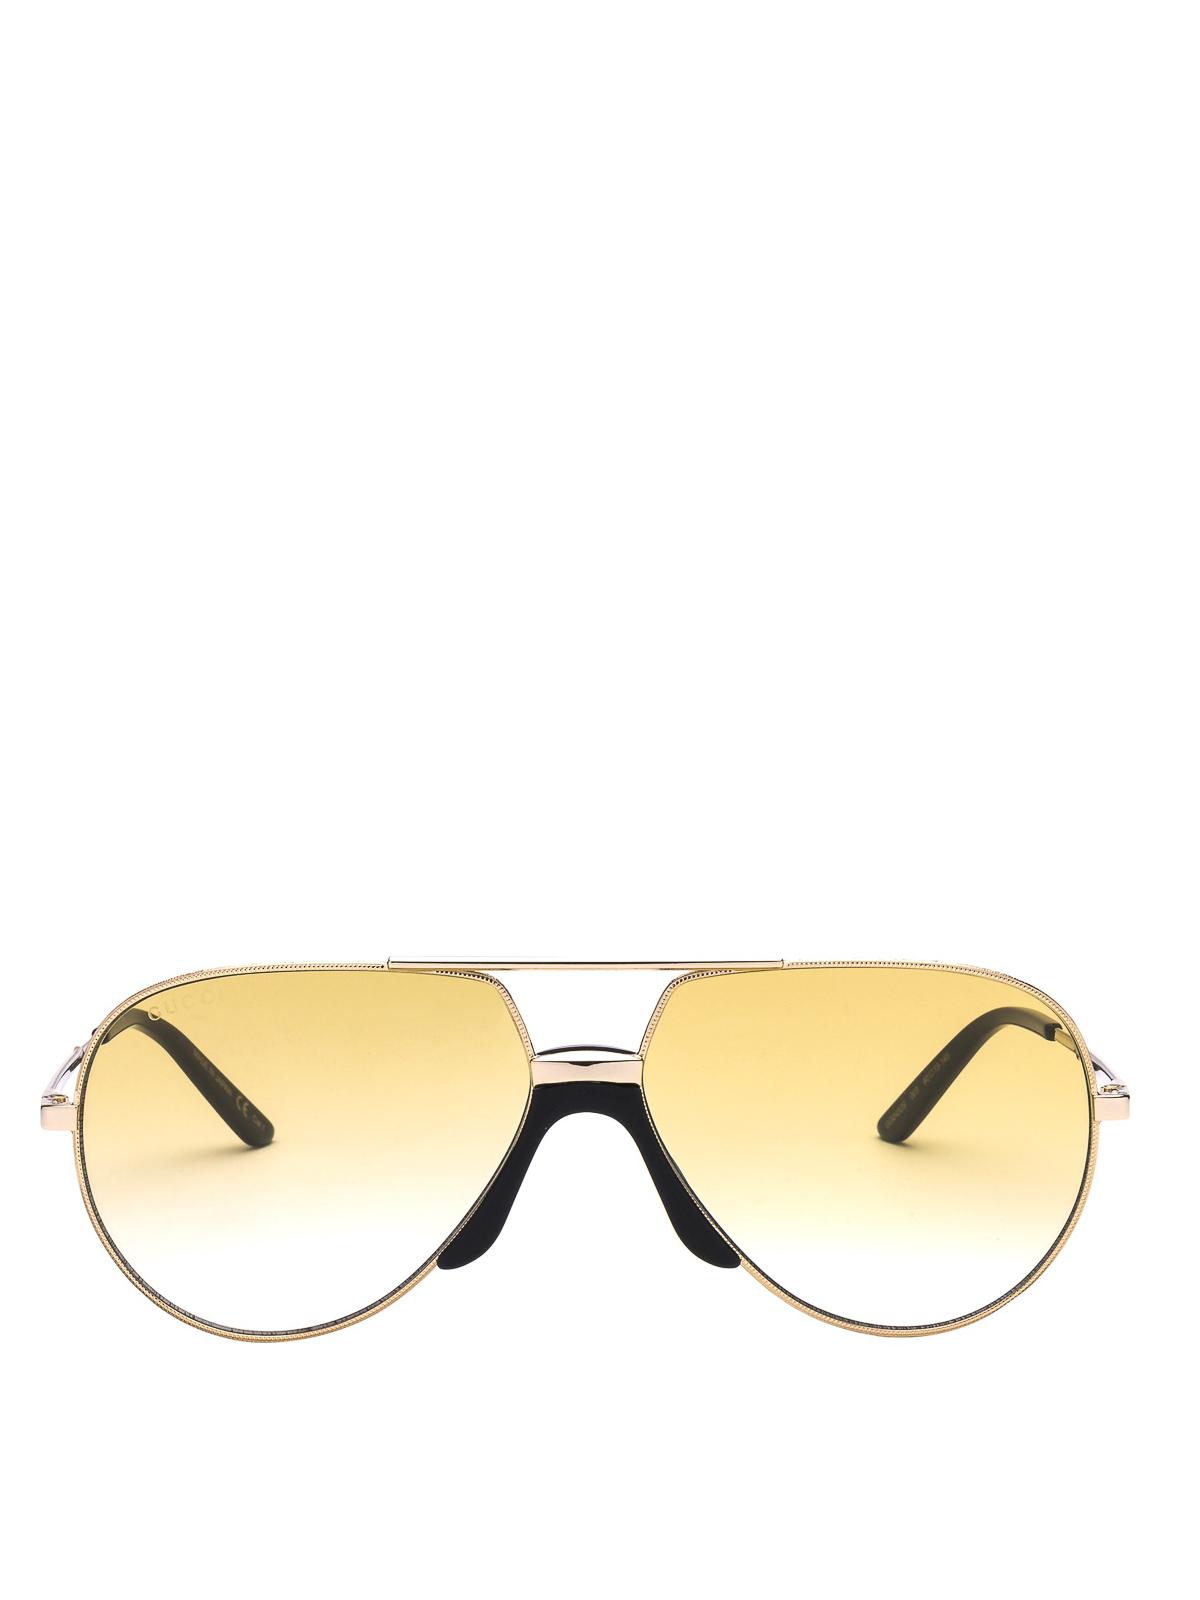 5d9f59ec92e10 iKRIX GUCCI  sunglasses - Aviator sunglasses with black acetate details